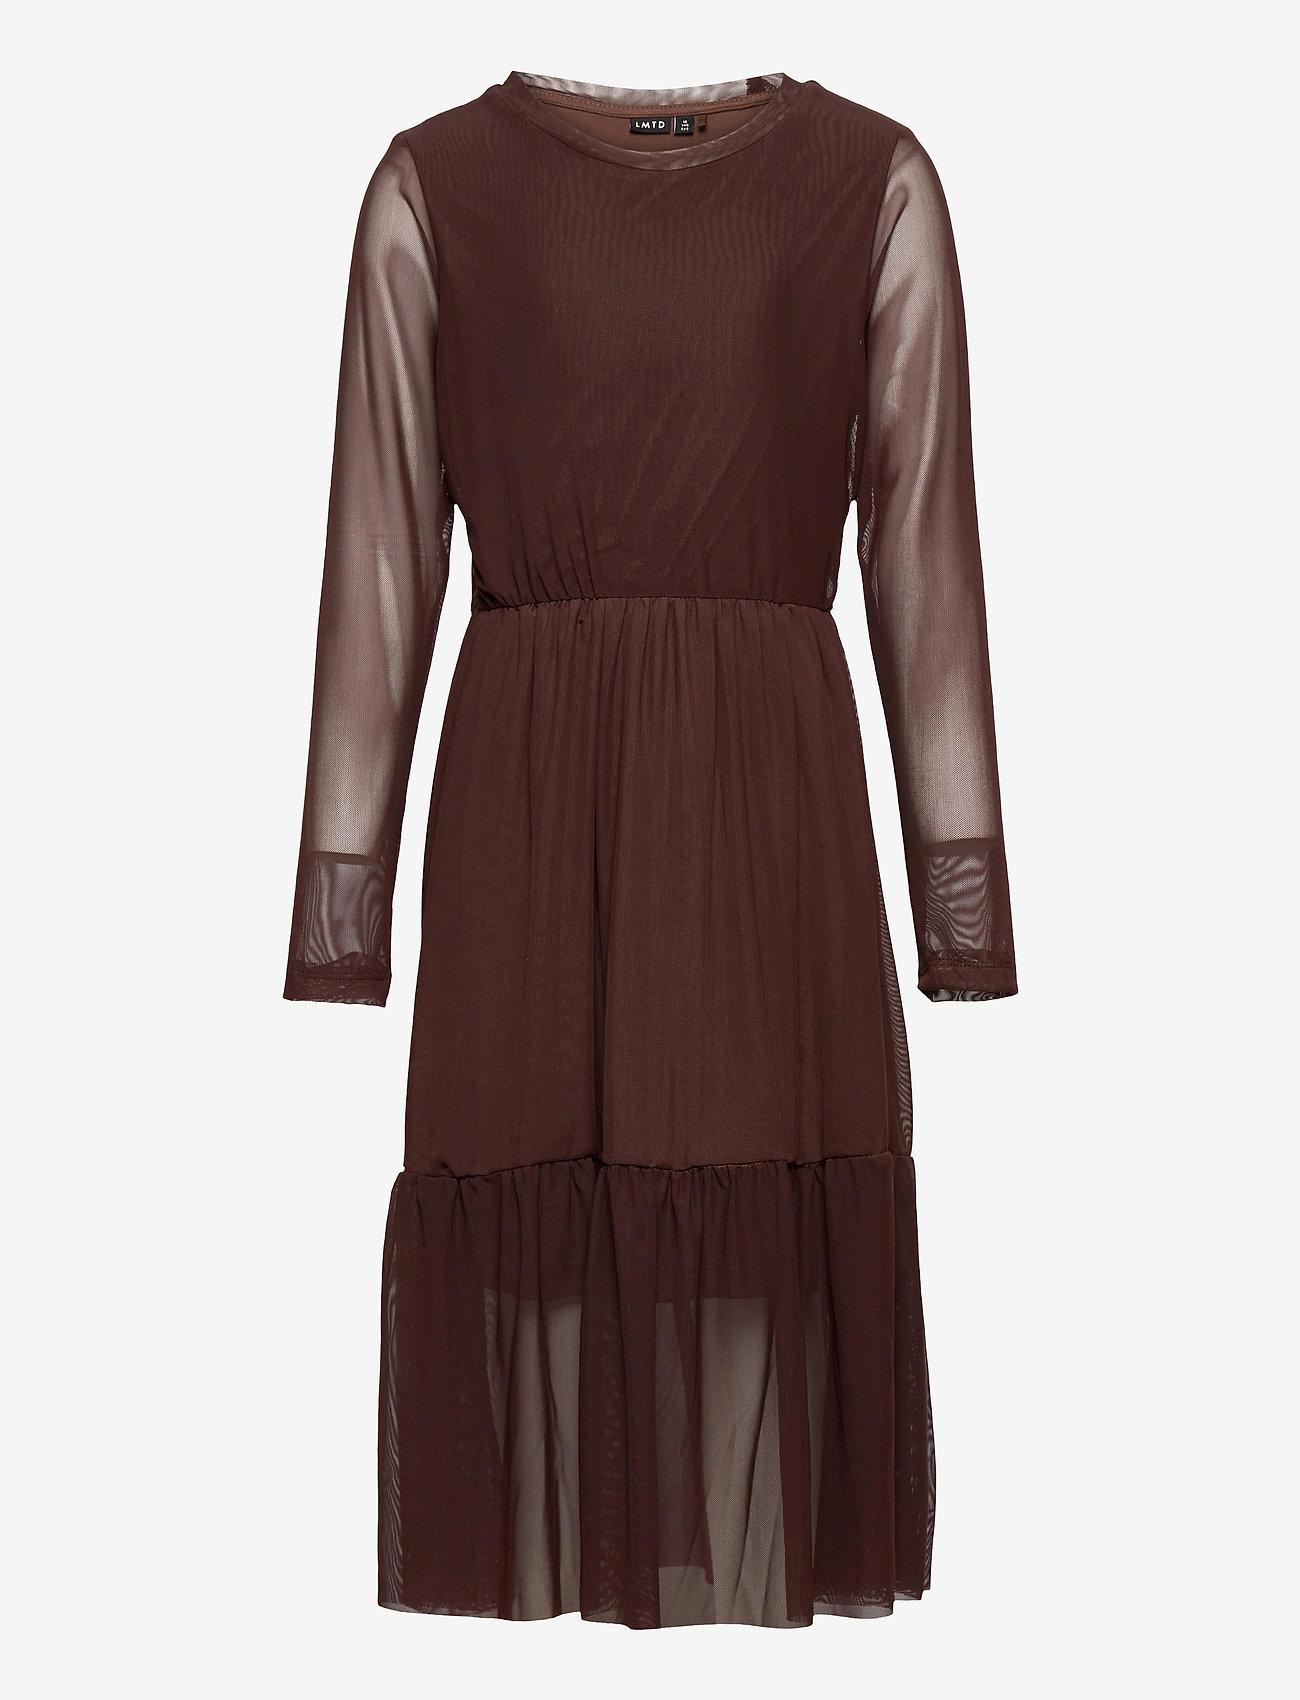 LMTD - NLFRESH LS DRESS - kleider - chestnut - 0